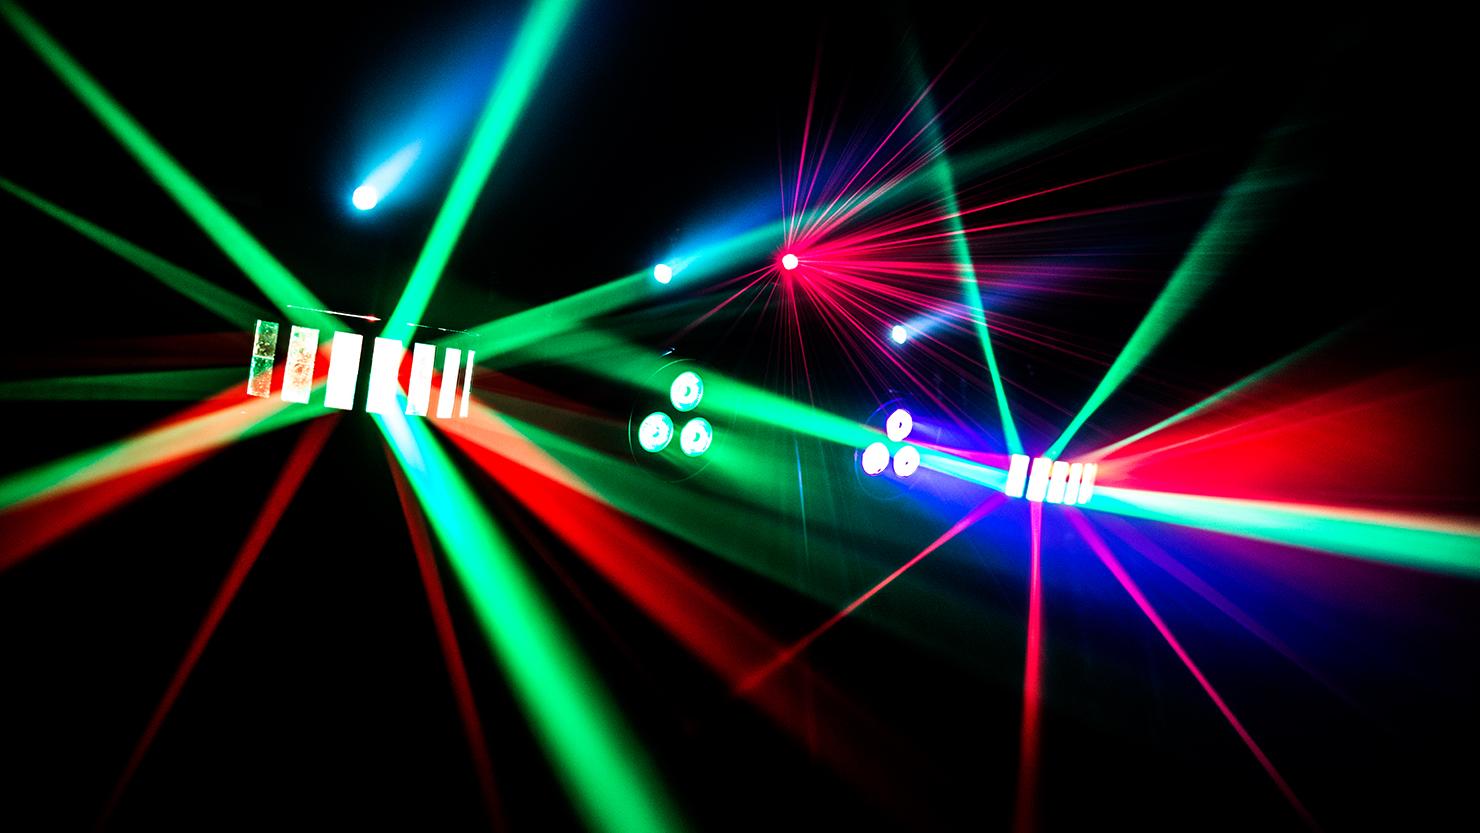 Gigbar Irc likewise Chauvet Led Fog Machine Geyser besides Chauvet Intimidator Spot 100 Icr besides Dj Lights In San Diego moreover Your Name In Lights. on chauvet laser lights